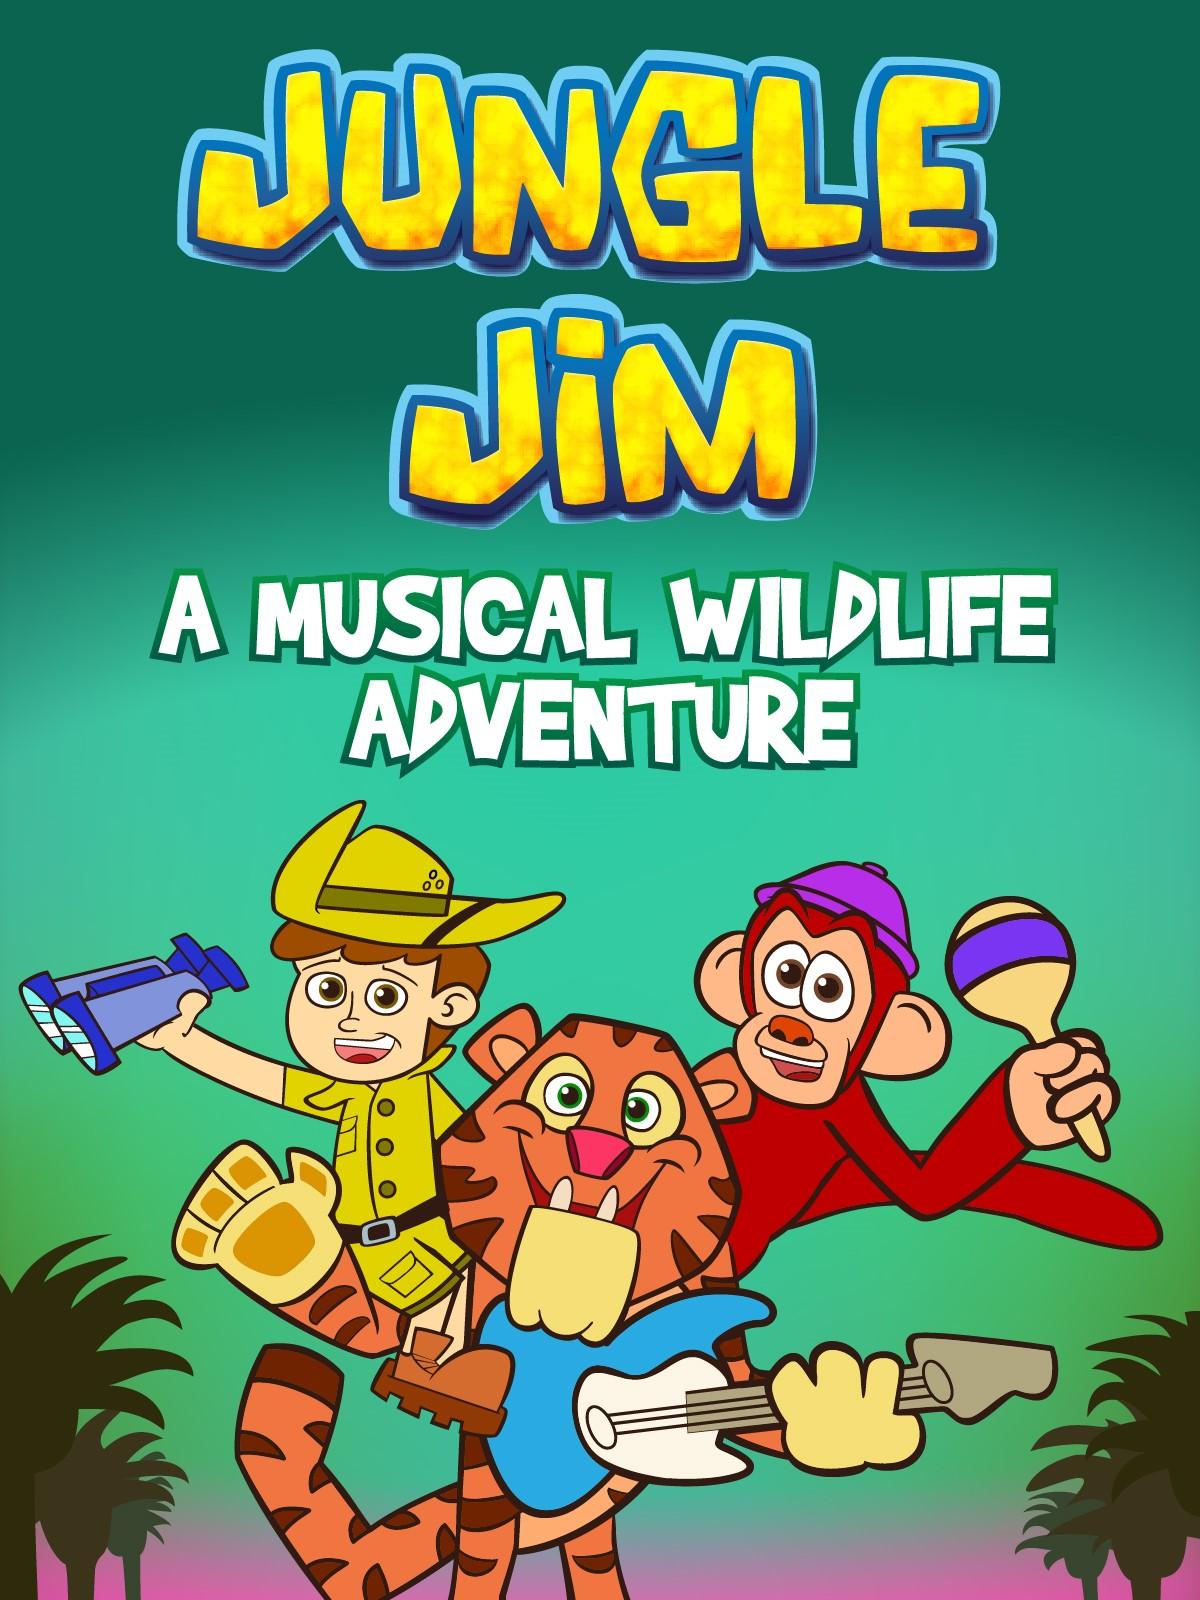 Jungle Jim - A Musical Wildlife Adventure A New Show for Preschoolers